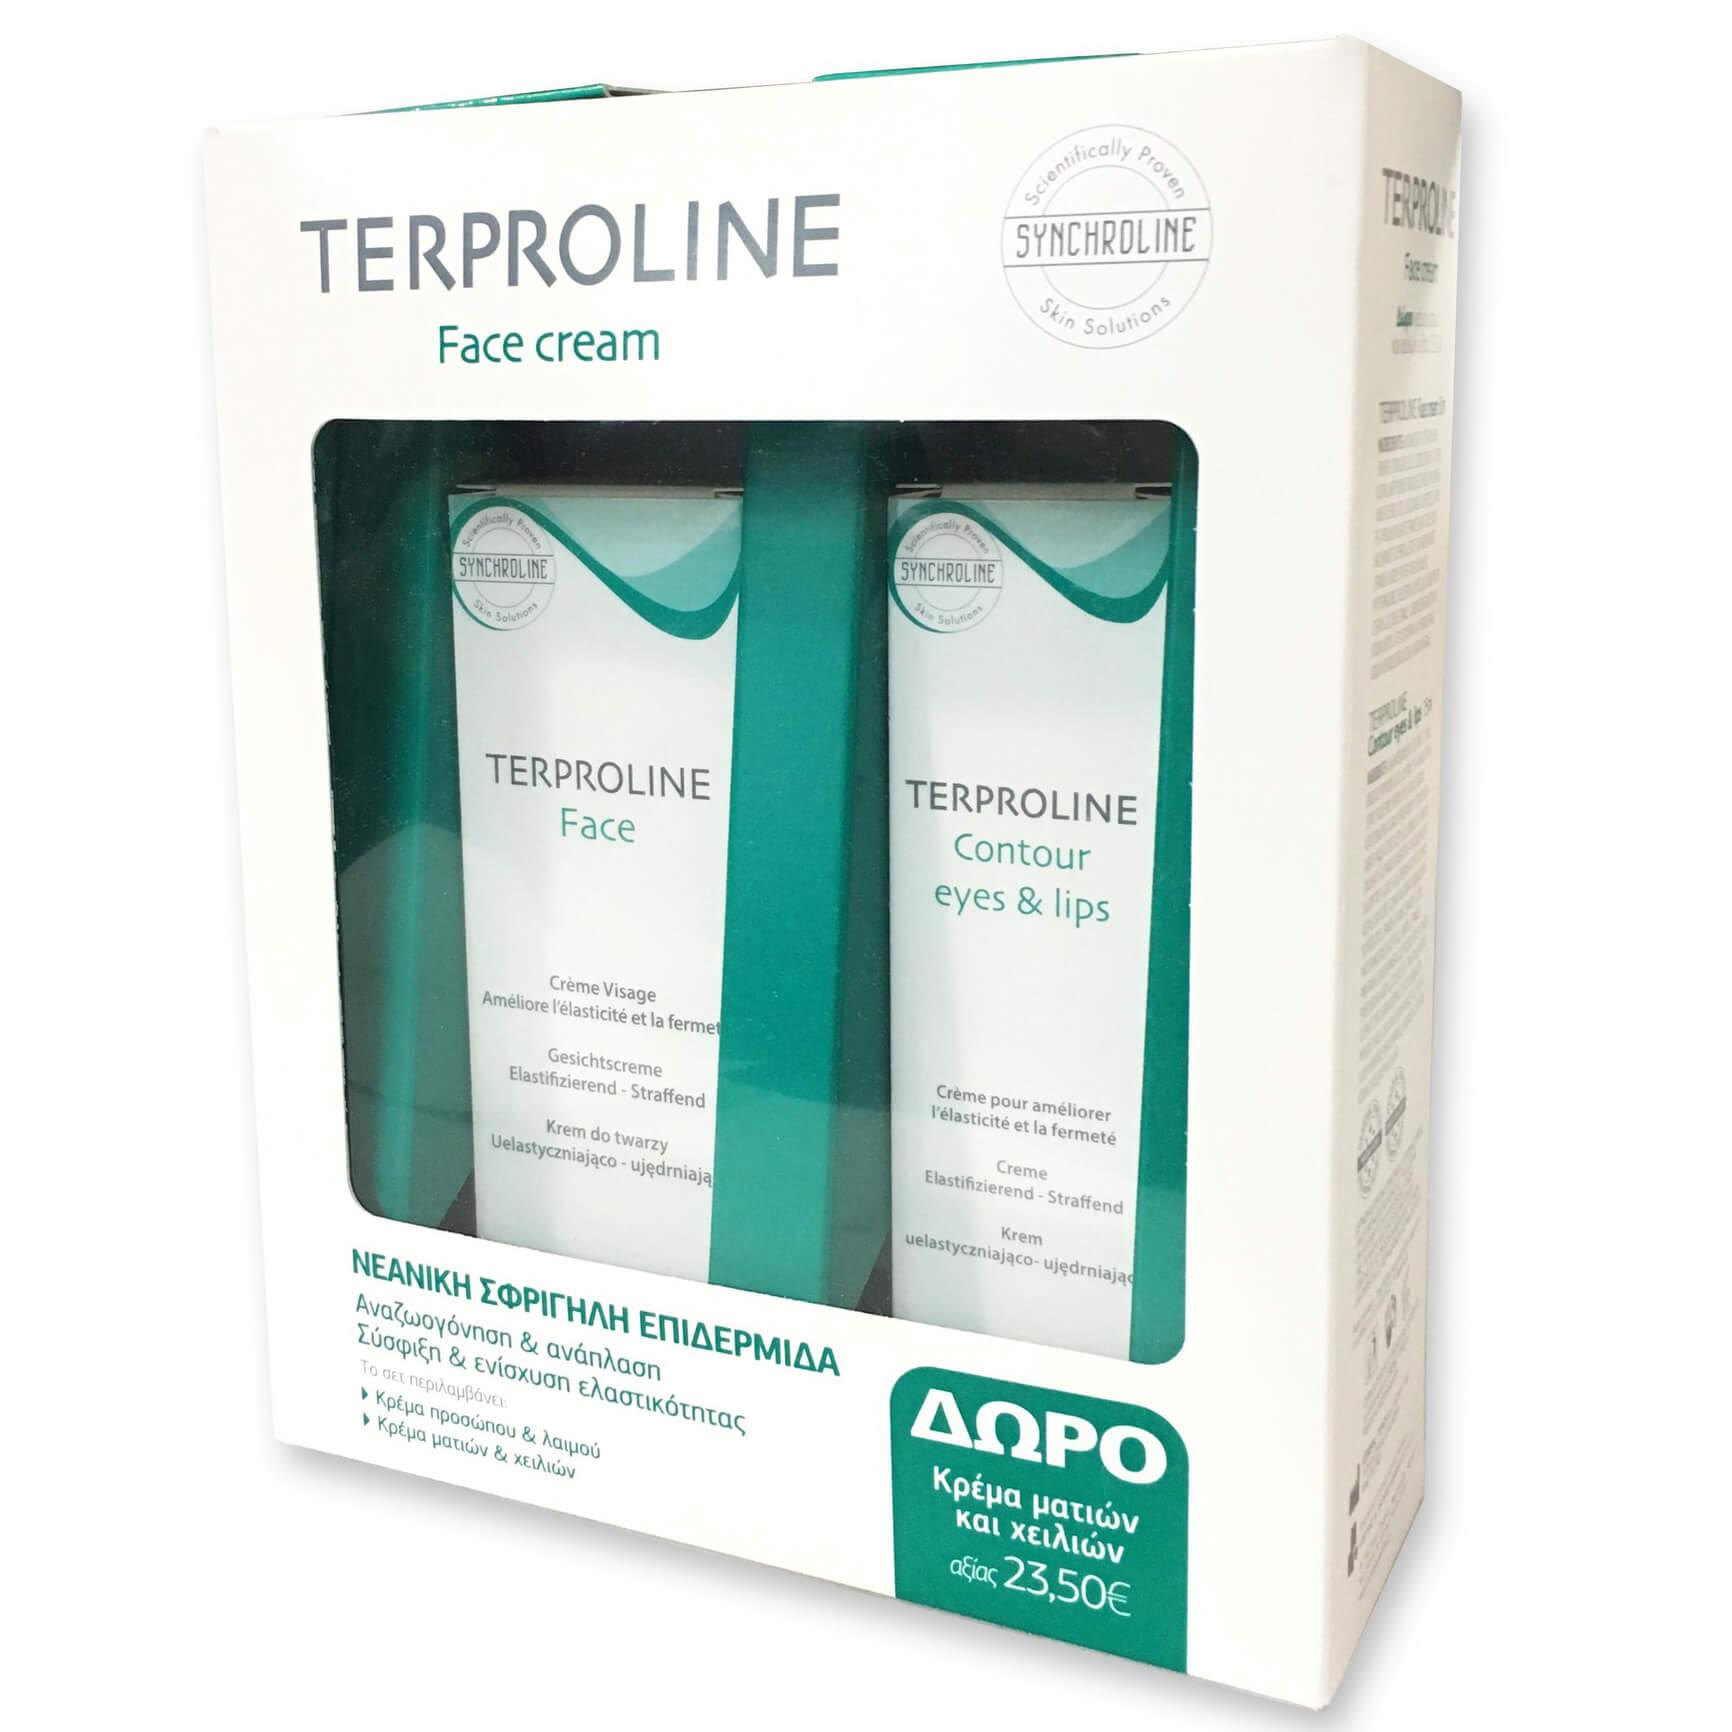 Synchroline Terproline Πακέτο Προσφοράς Terproline Face Cream 50ml & Δώρο Terproline Contour Eyes & Lips Cream 15ml